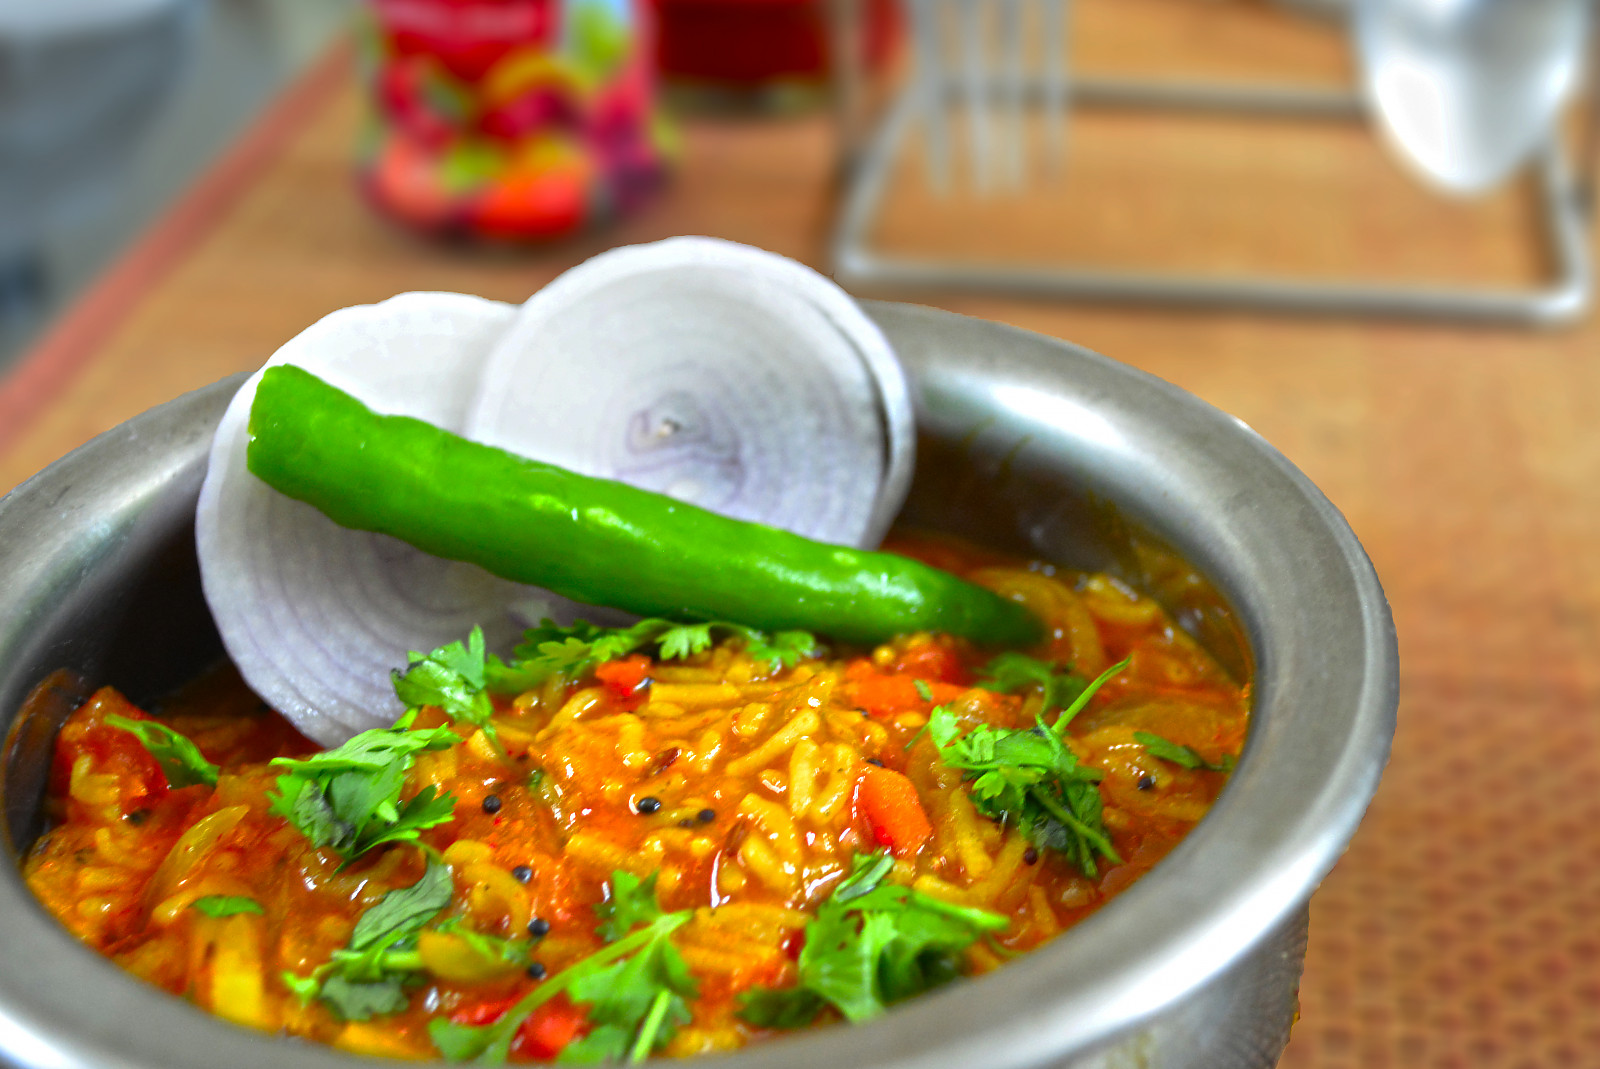 Rajasthani sev tamatar ki sabzi recipe by archanas kitchen rajasthani sev tamatar ki sabzi recipe forumfinder Choice Image